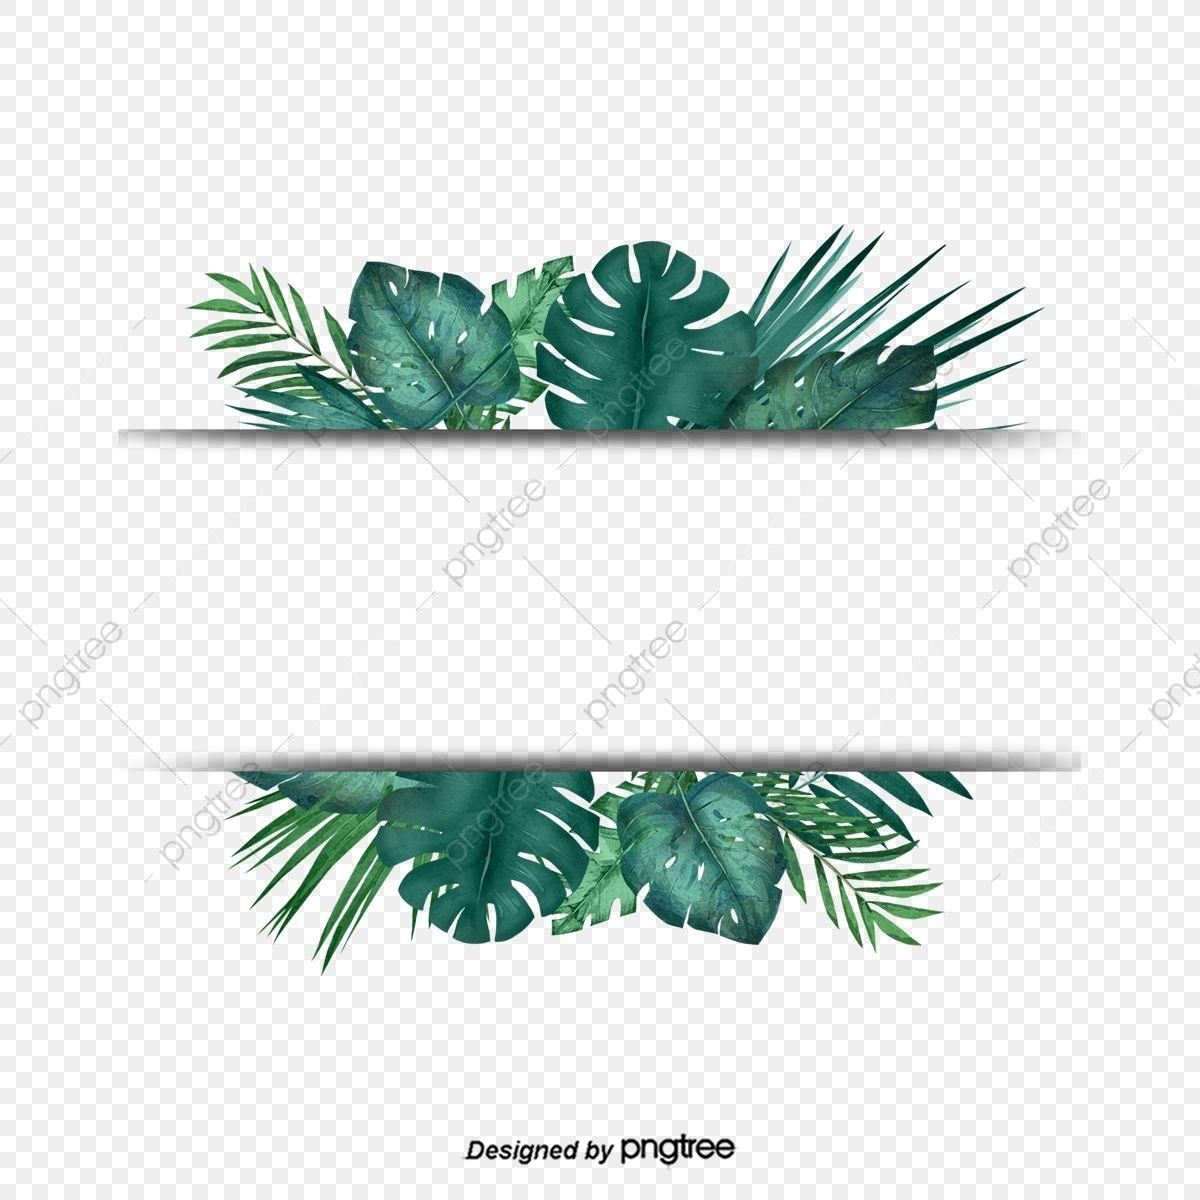 Green Tropical Plant Palm Leaf Border Border Clipart Palm Leaf Botany Png Transparent Clipart Image And Psd File For Free Download Palm Background Leaf Border Leaves Vector